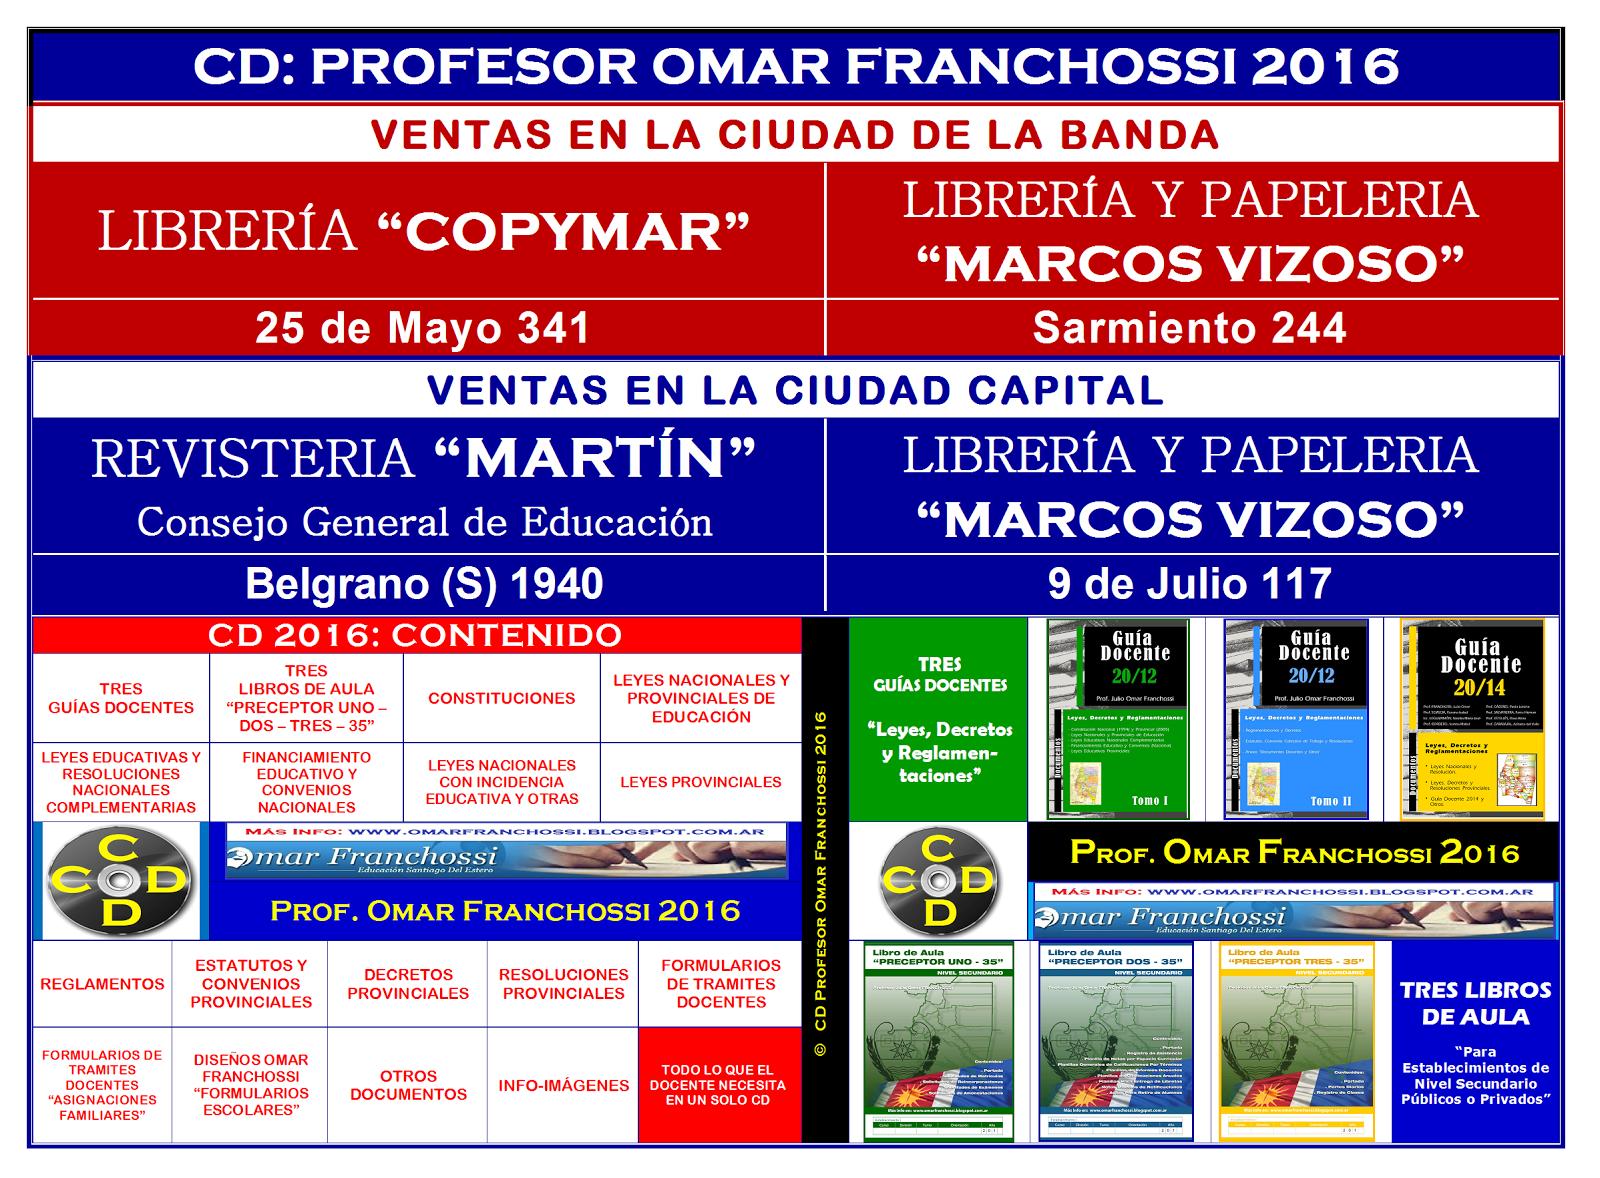 NUEVO CD: PROF. OMAR FRANCHOSSI 2016